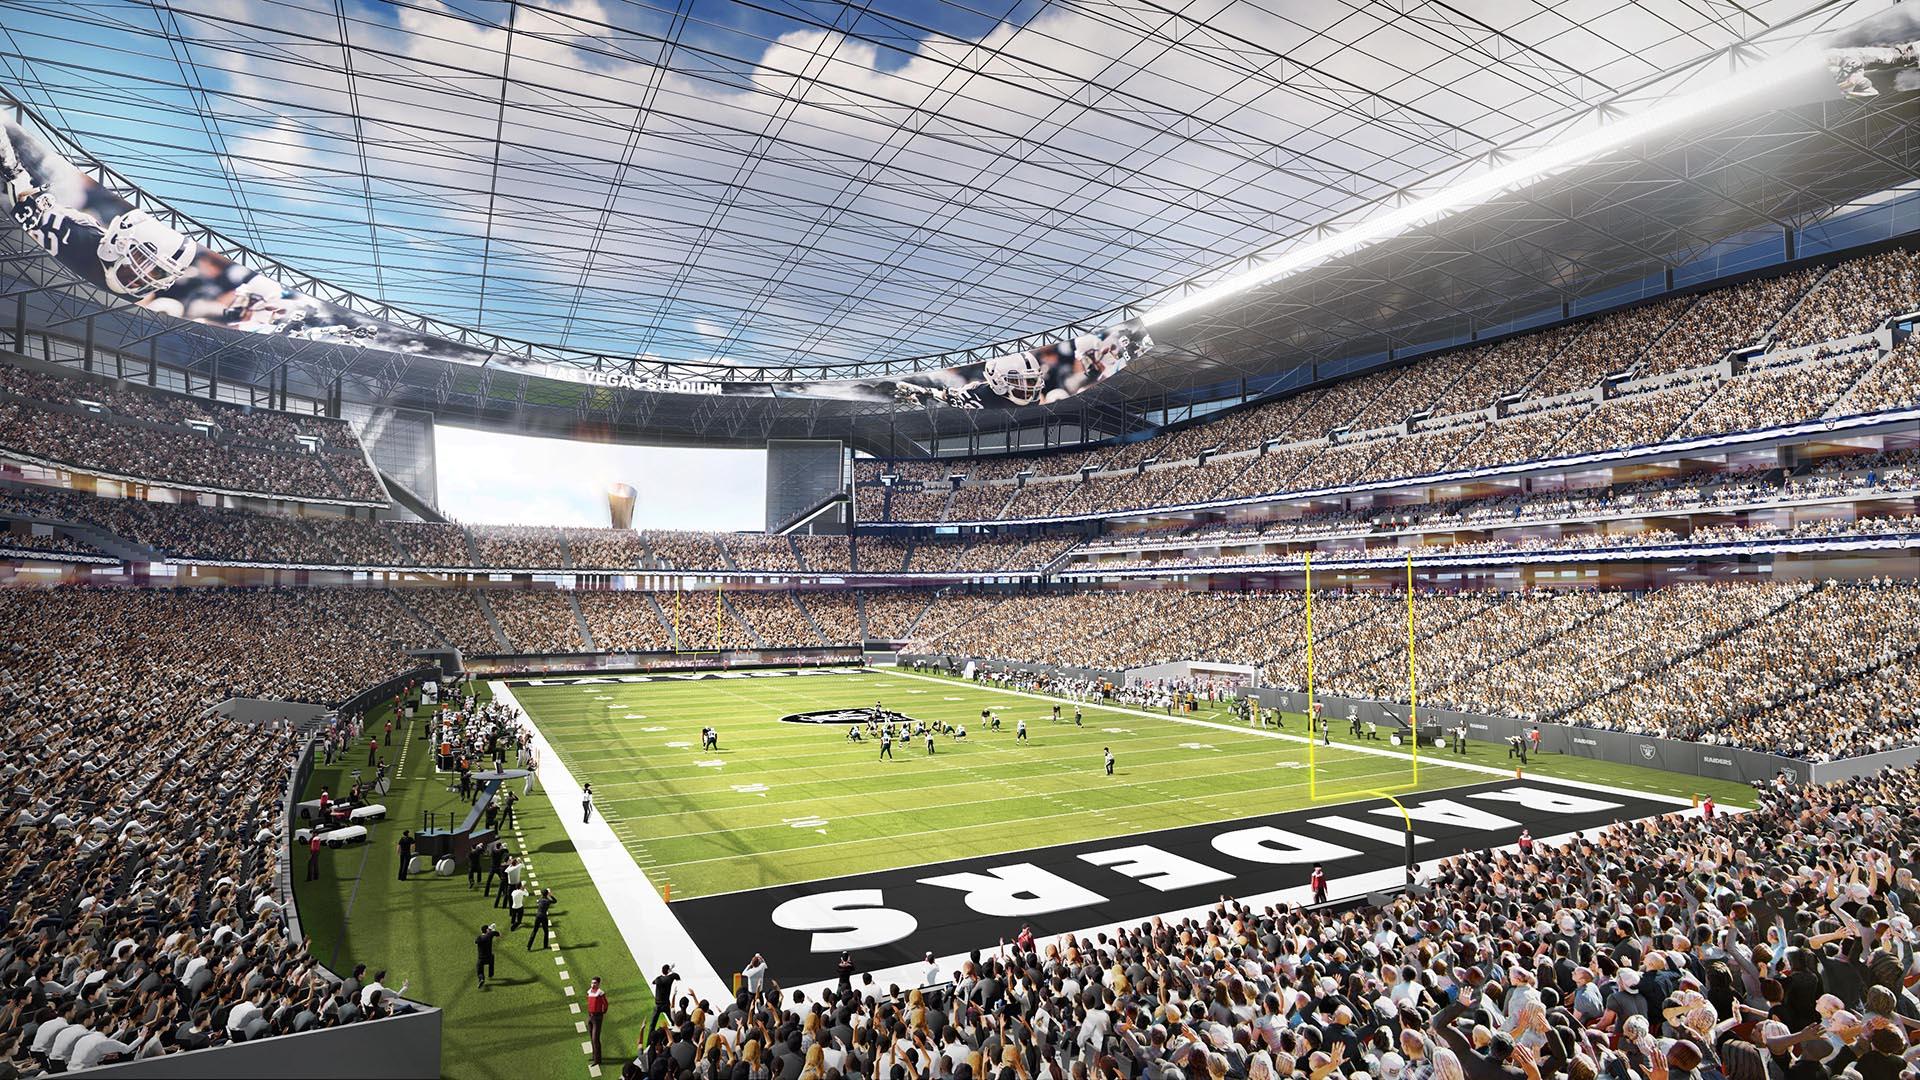 Las Vegas Raiders Images Of Their Stunning 2 Billion